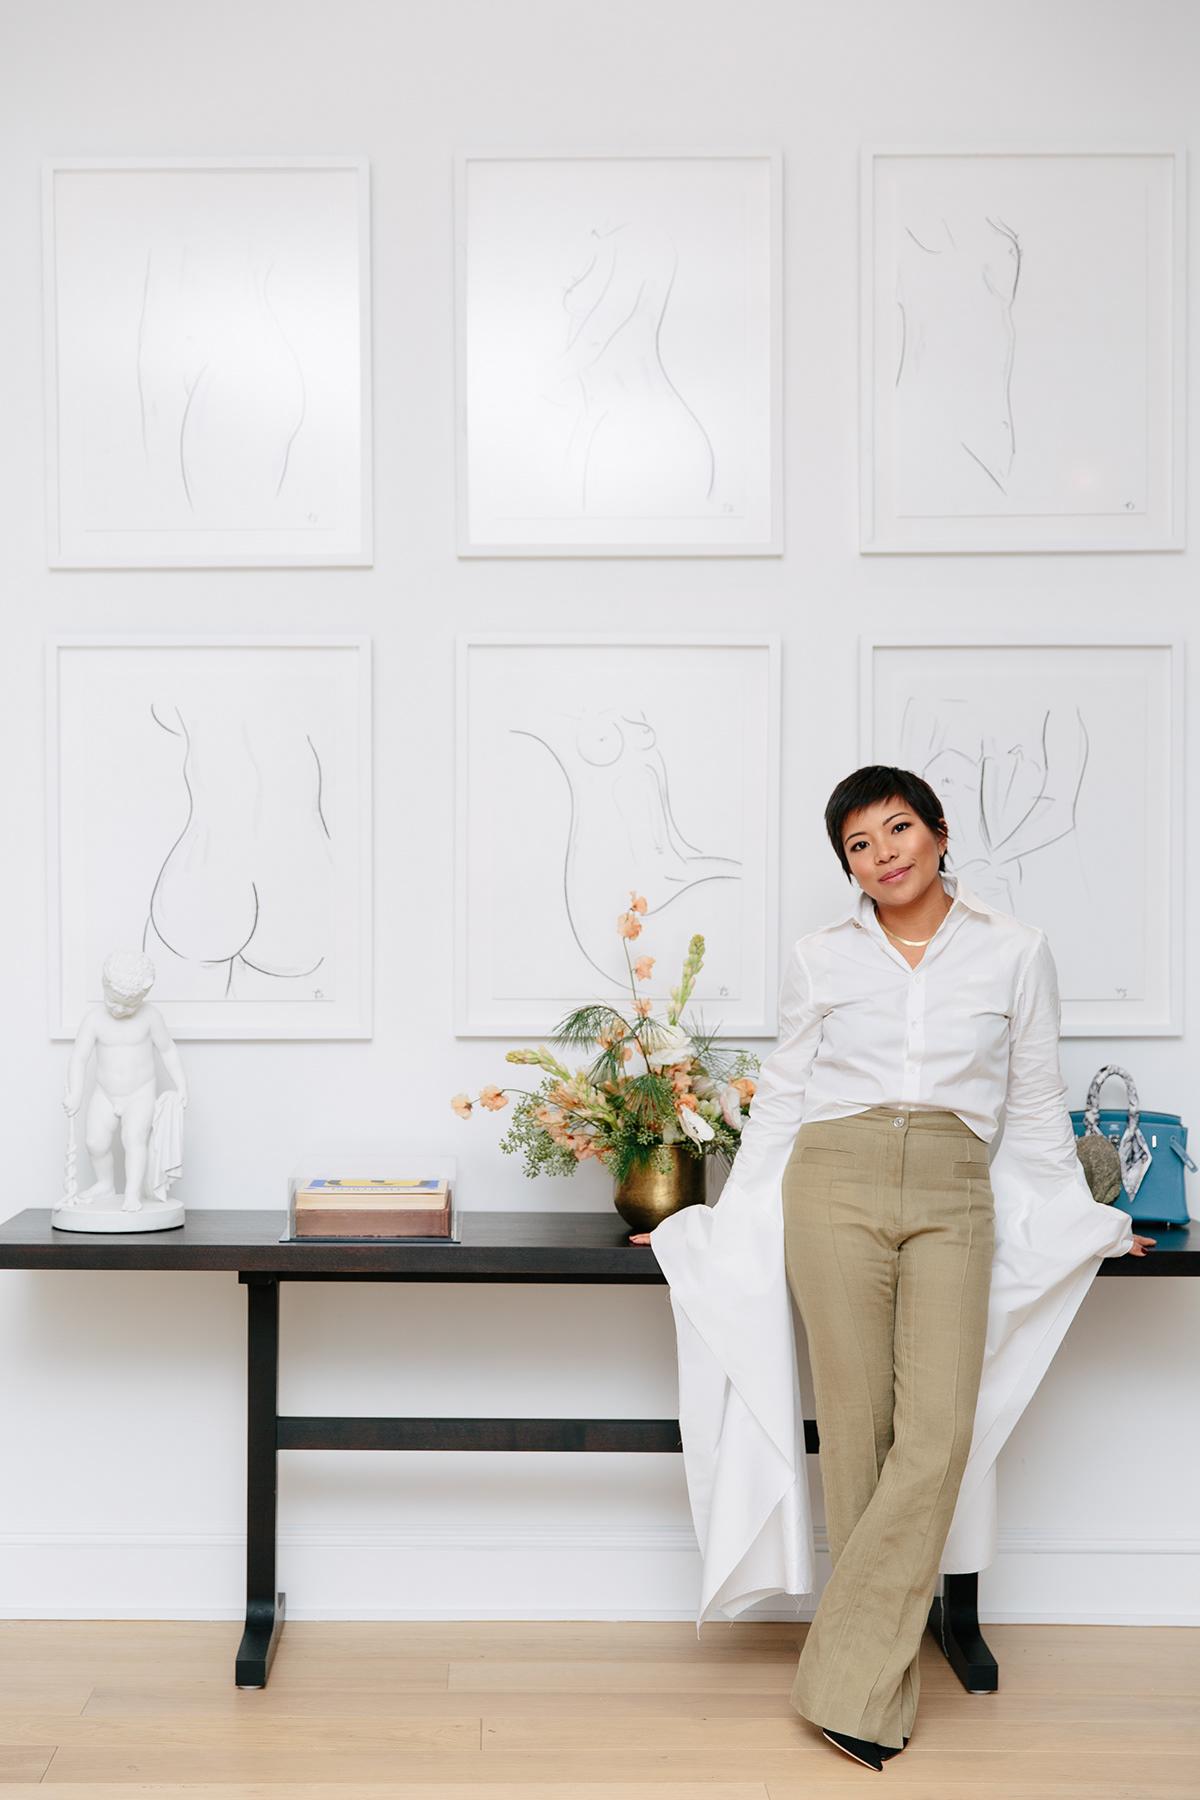 away Jennifer Rubio vogue portrait